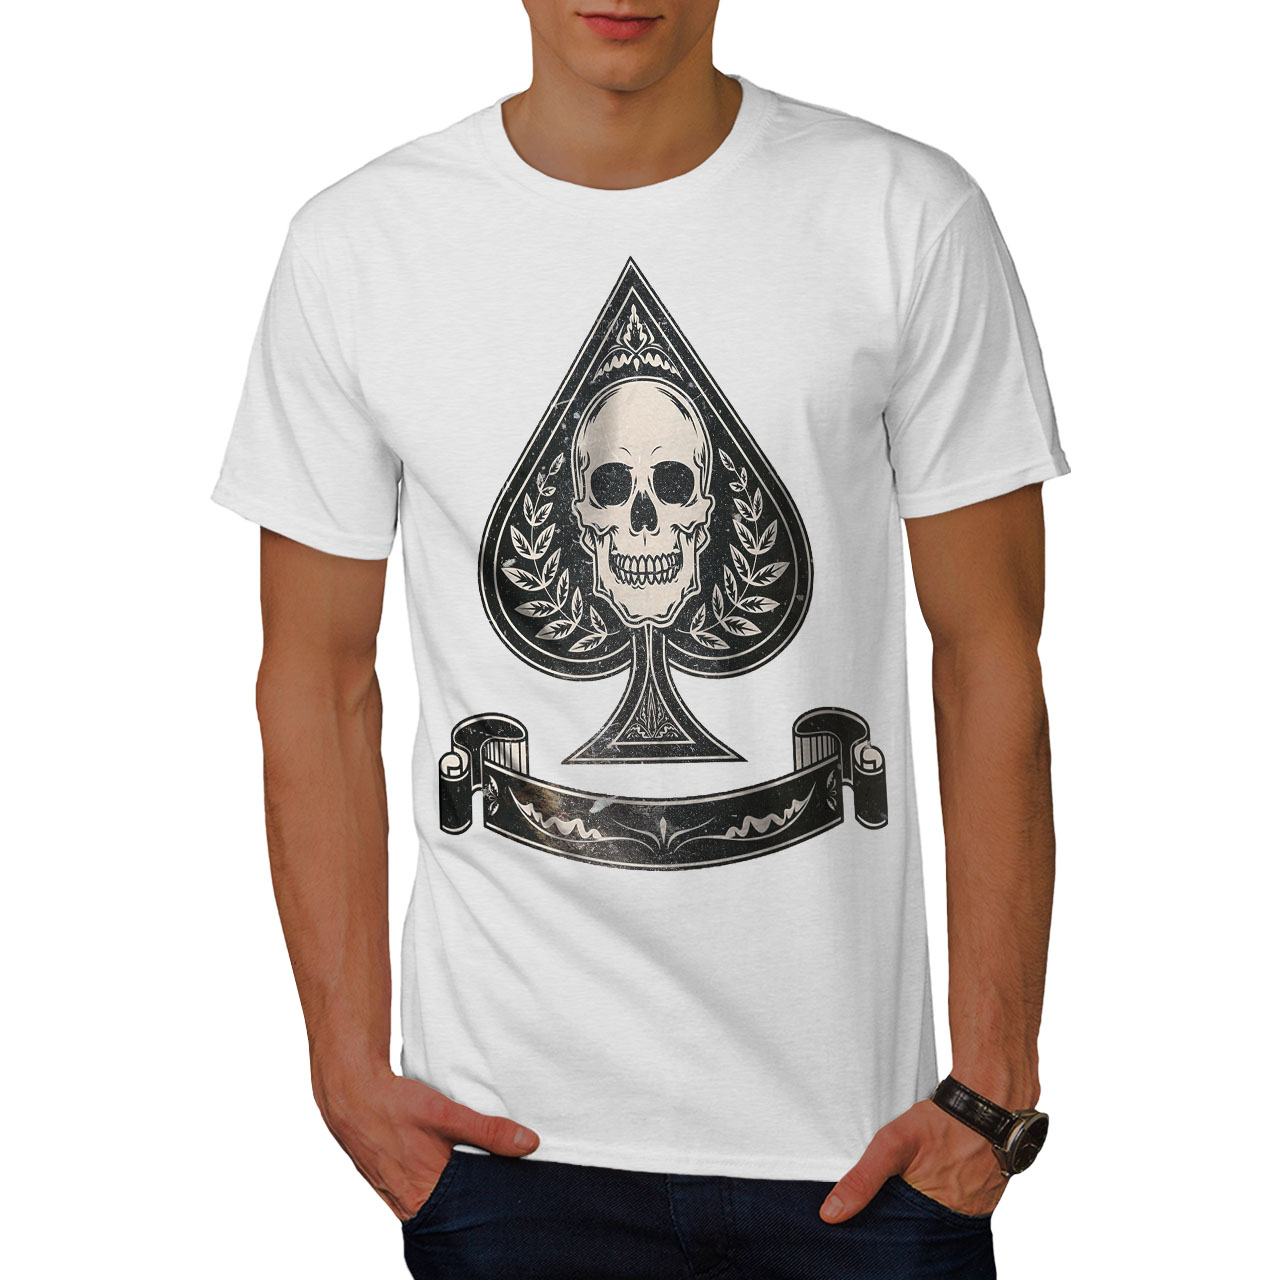 Card Graphic Design Printed Tee Wellcoda Spades Skull Card Gamble Mens T-shirt